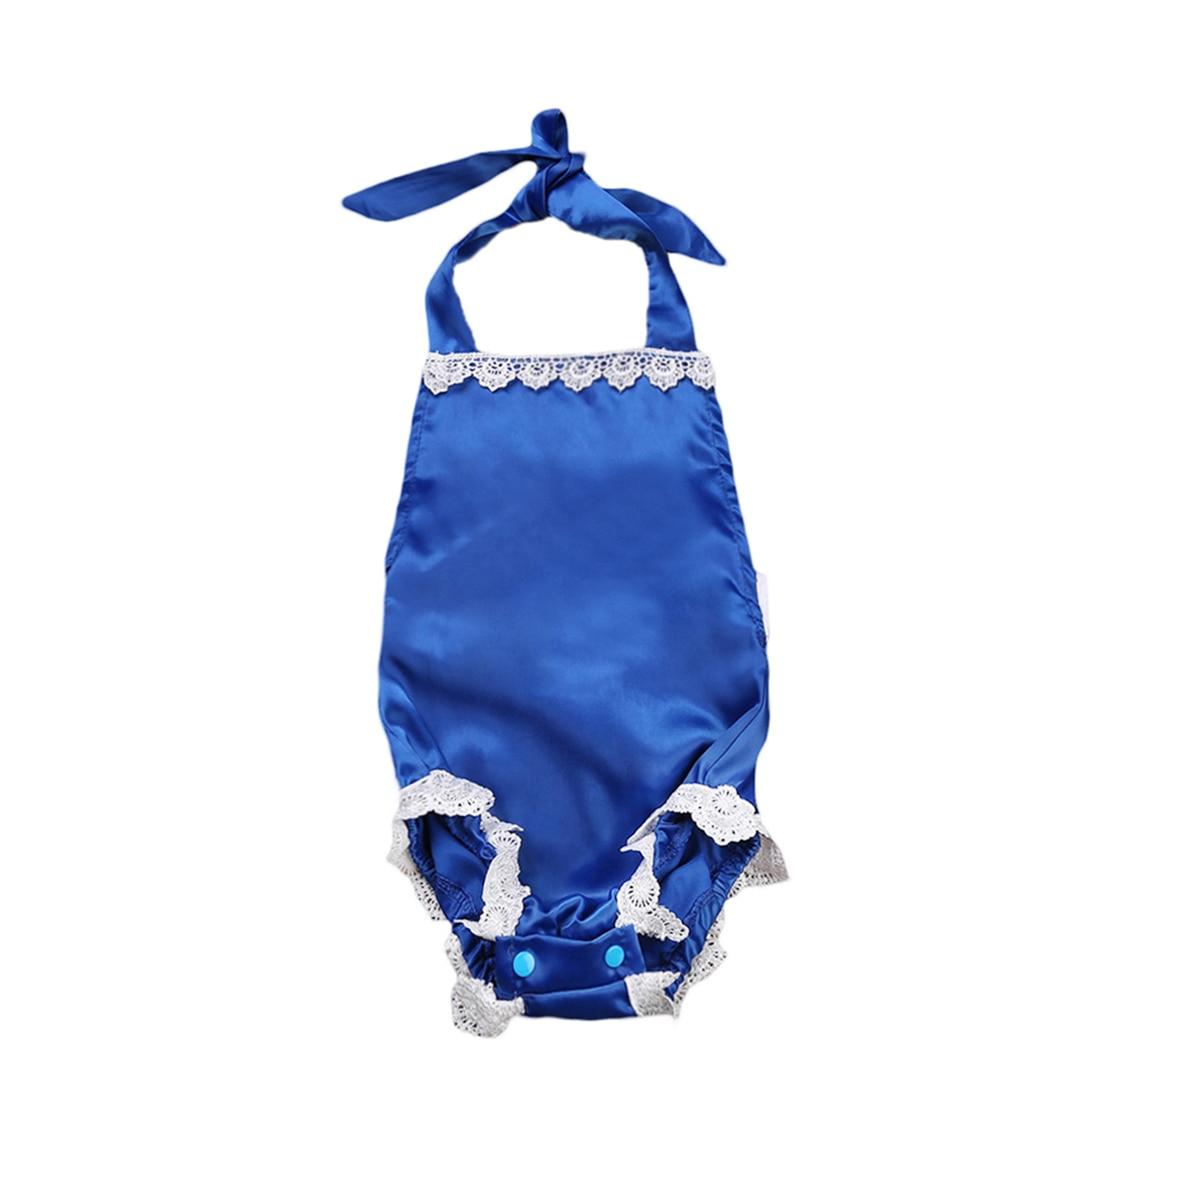 Newborn Infant Baby Girls Lace Floral Romper Jumpsuit Sunsuit Cotton Summer Casual Clothes One-Pieces Outfits